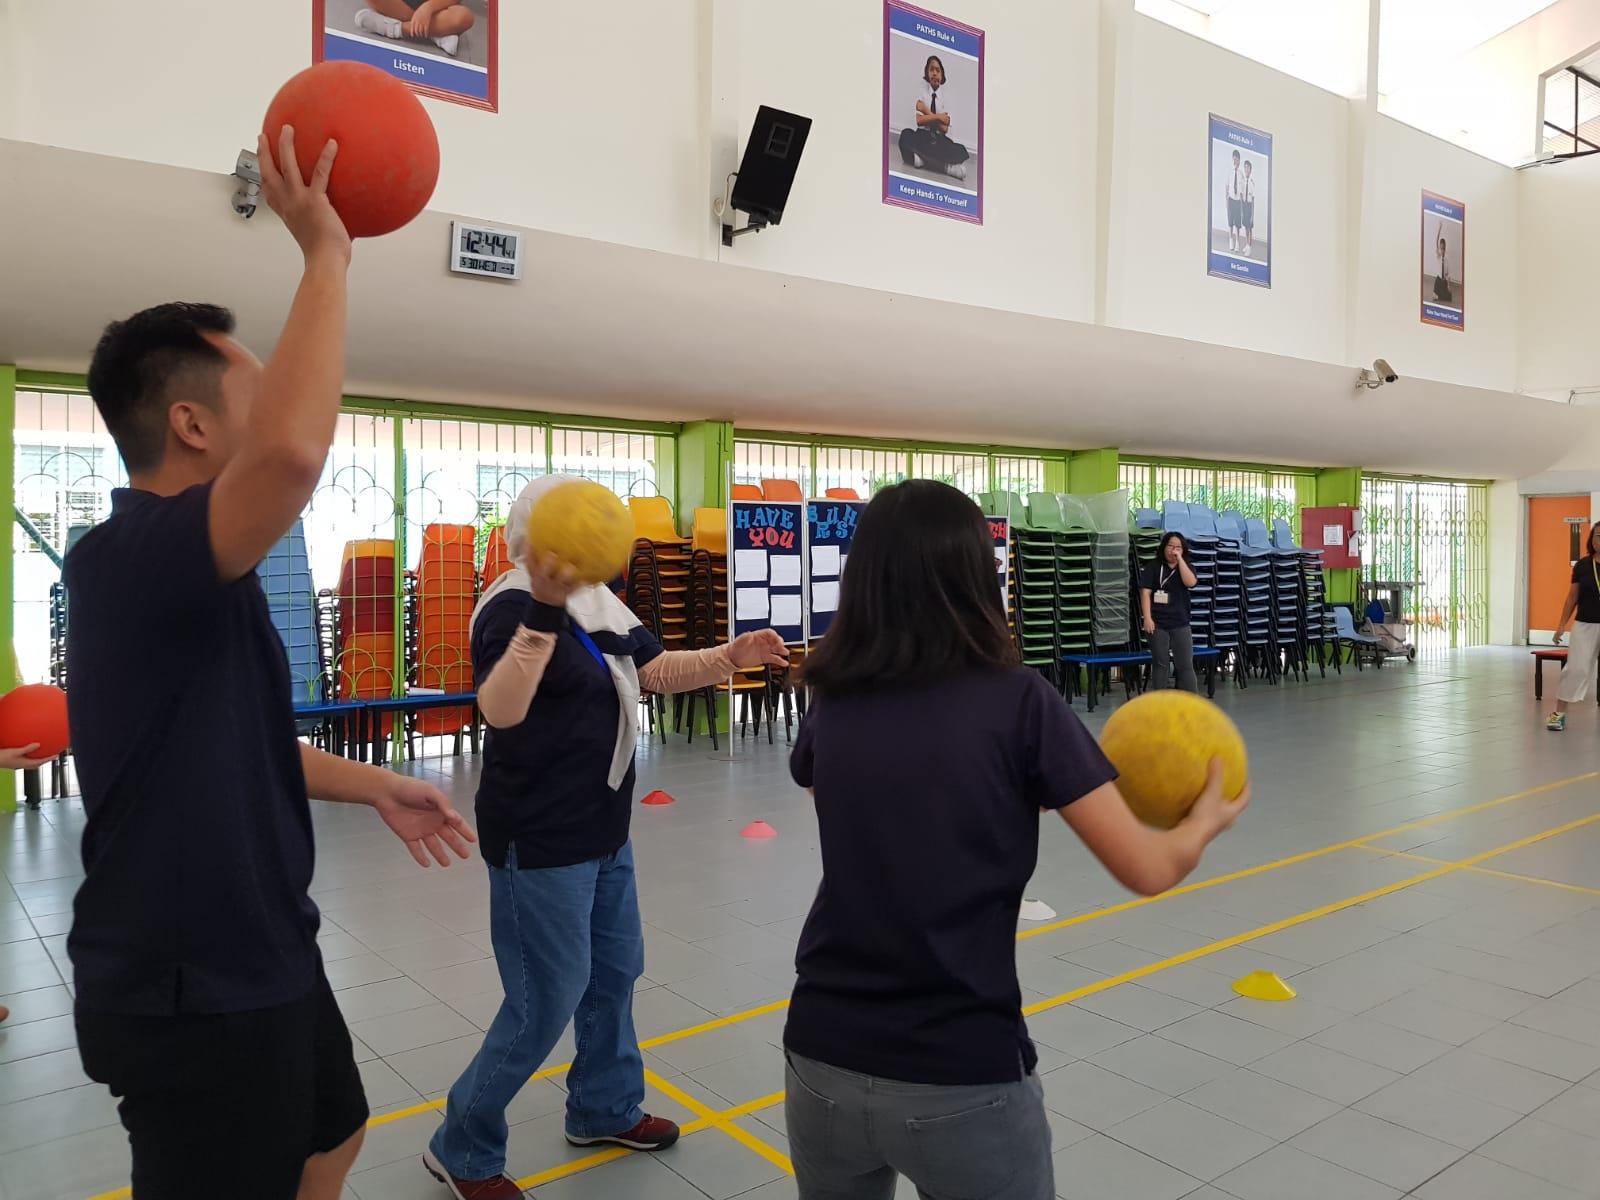 Fun_Activities_Dodgeball.jpeg